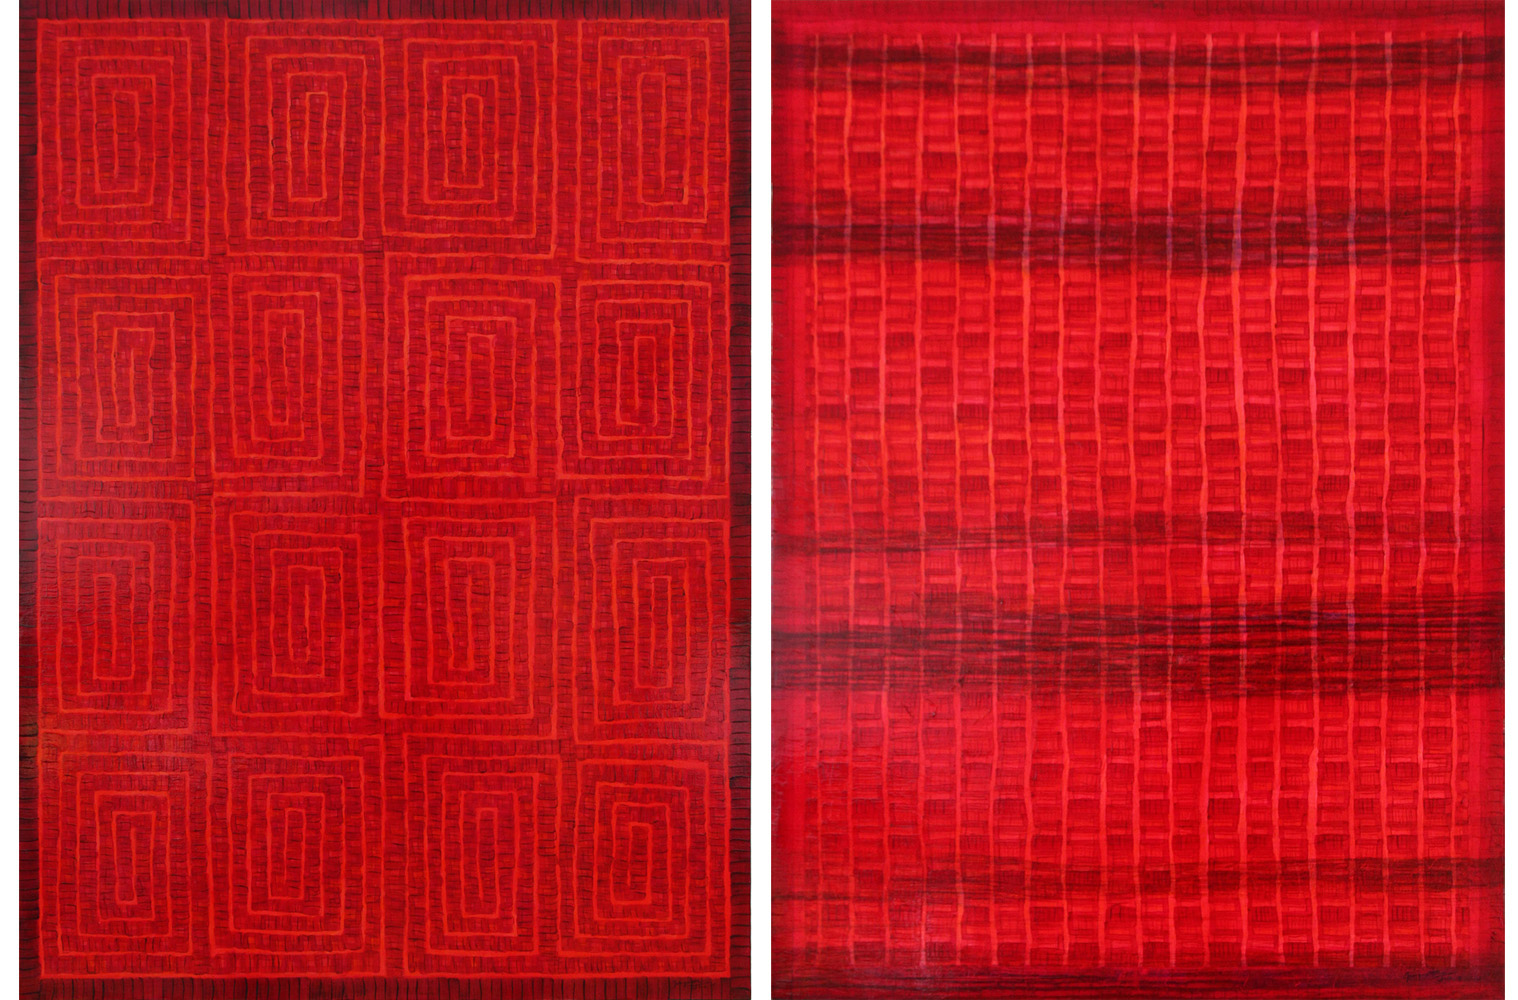 Jiang Weitao Paintings